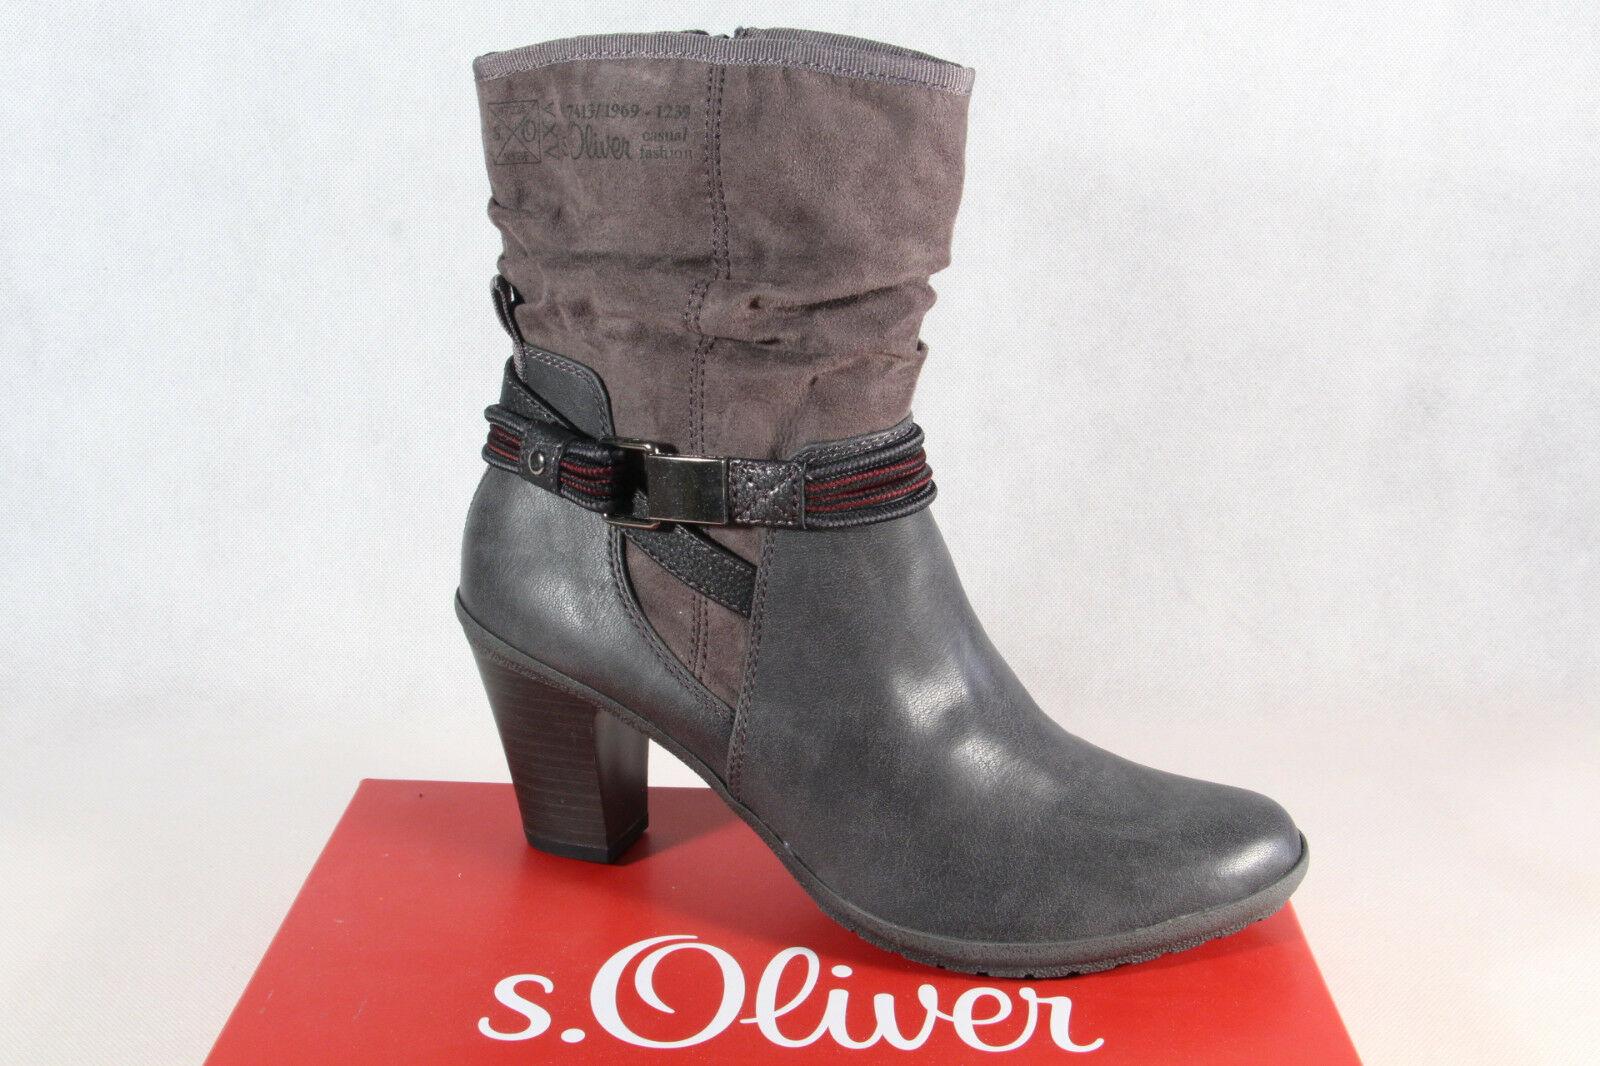 S.Oliver Damen Stiefel, Stiefelette, Stiefel grau 25337 NEU